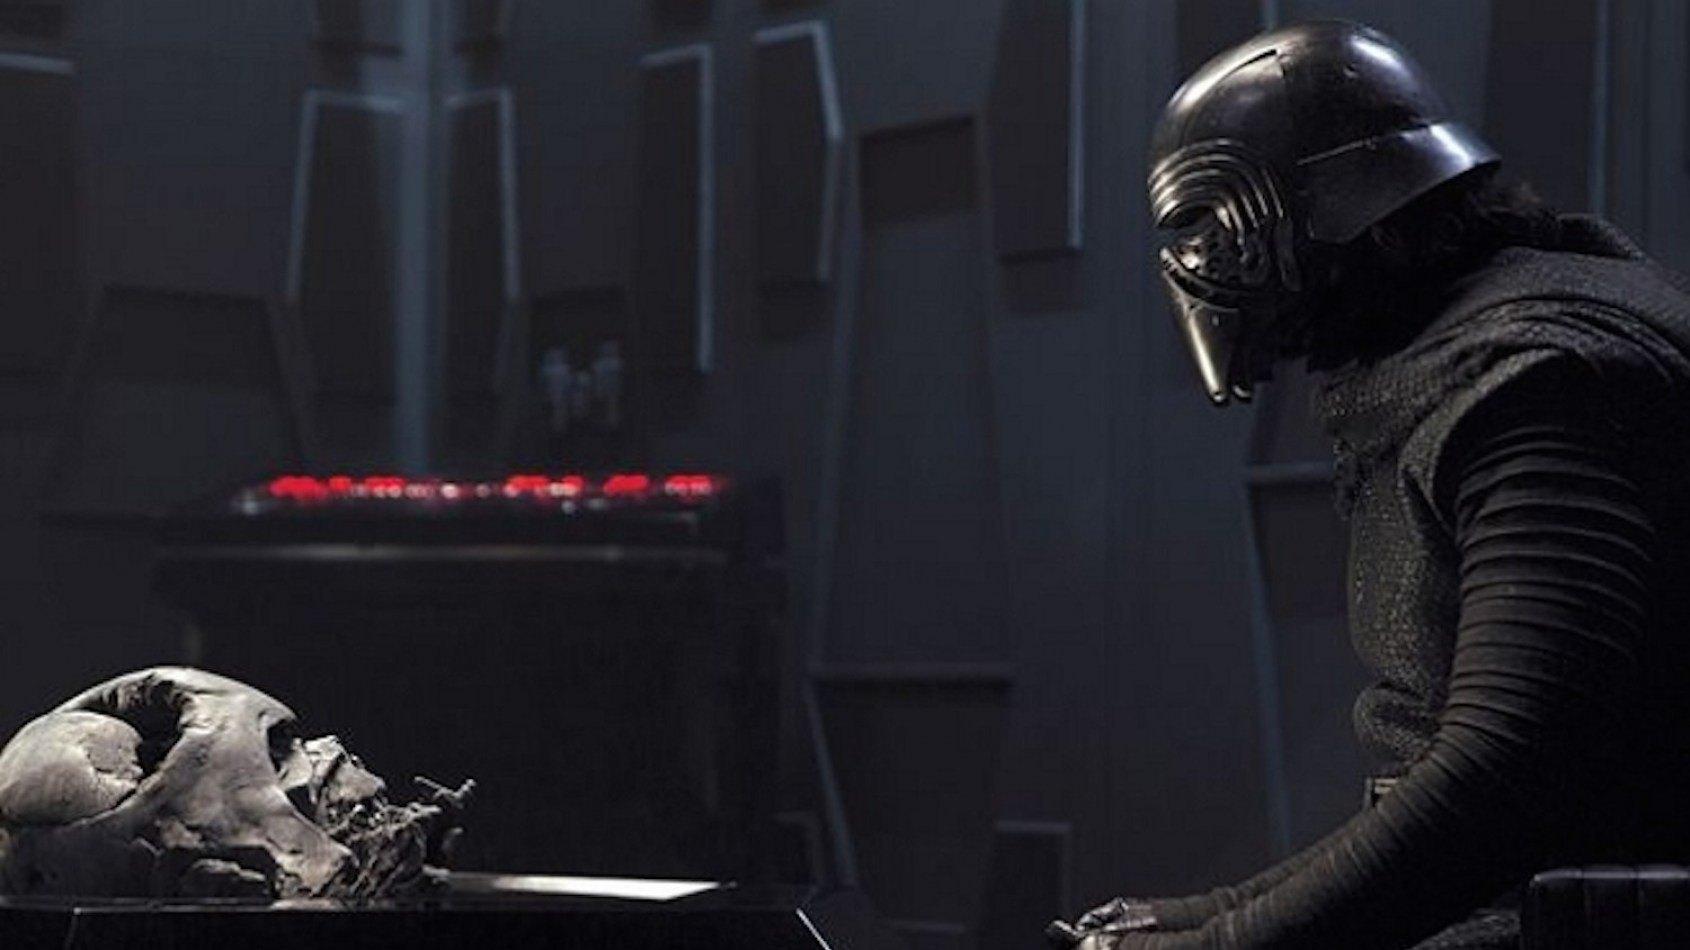 J.J. Abrams parle de la relation entre Kylo Ren et Darth Vader